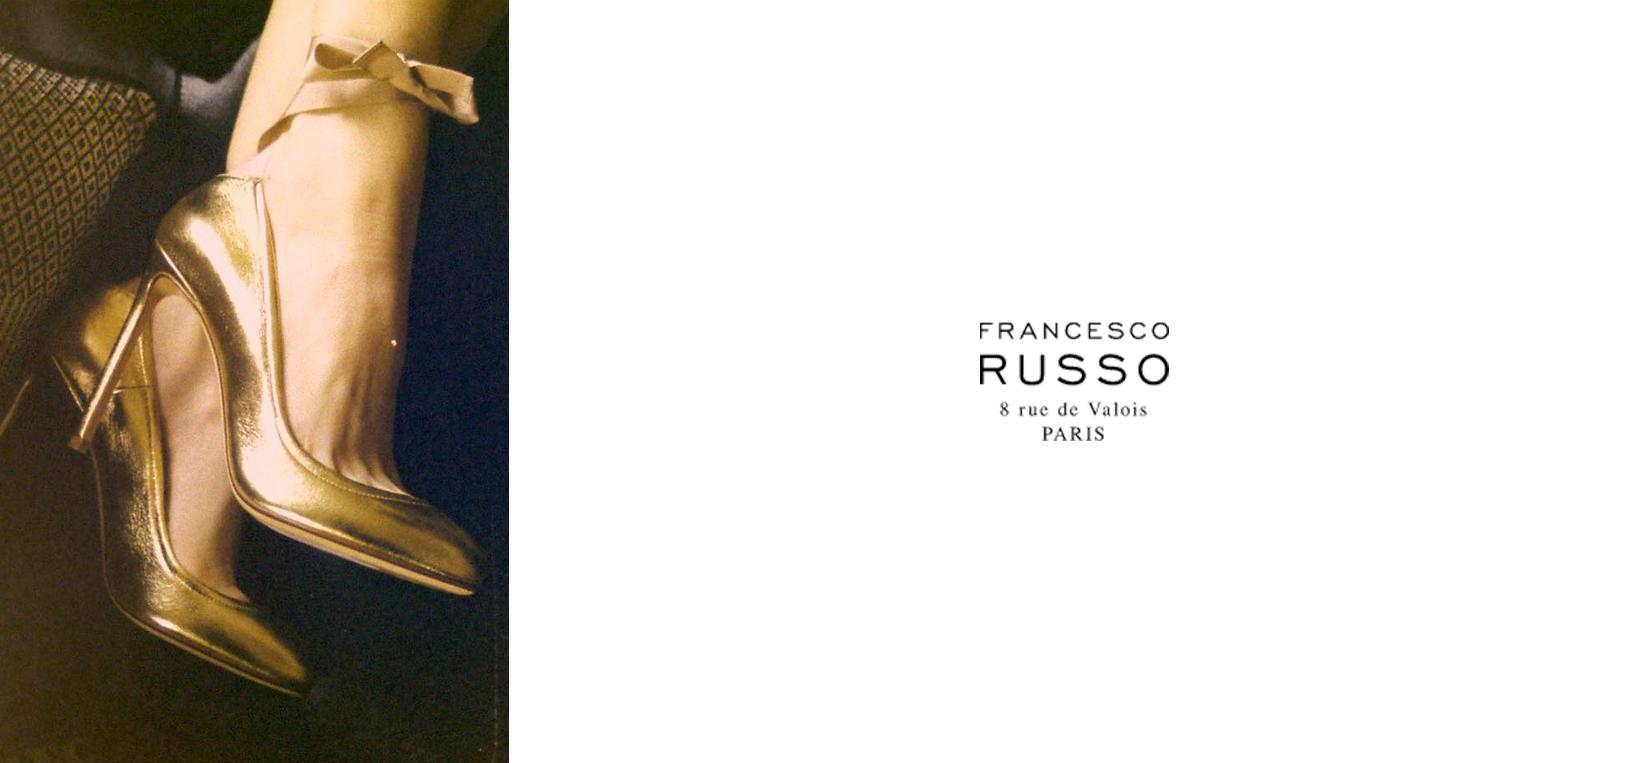 FRANCESCO RUSSO - Donna - Scarpe - Leam Roma